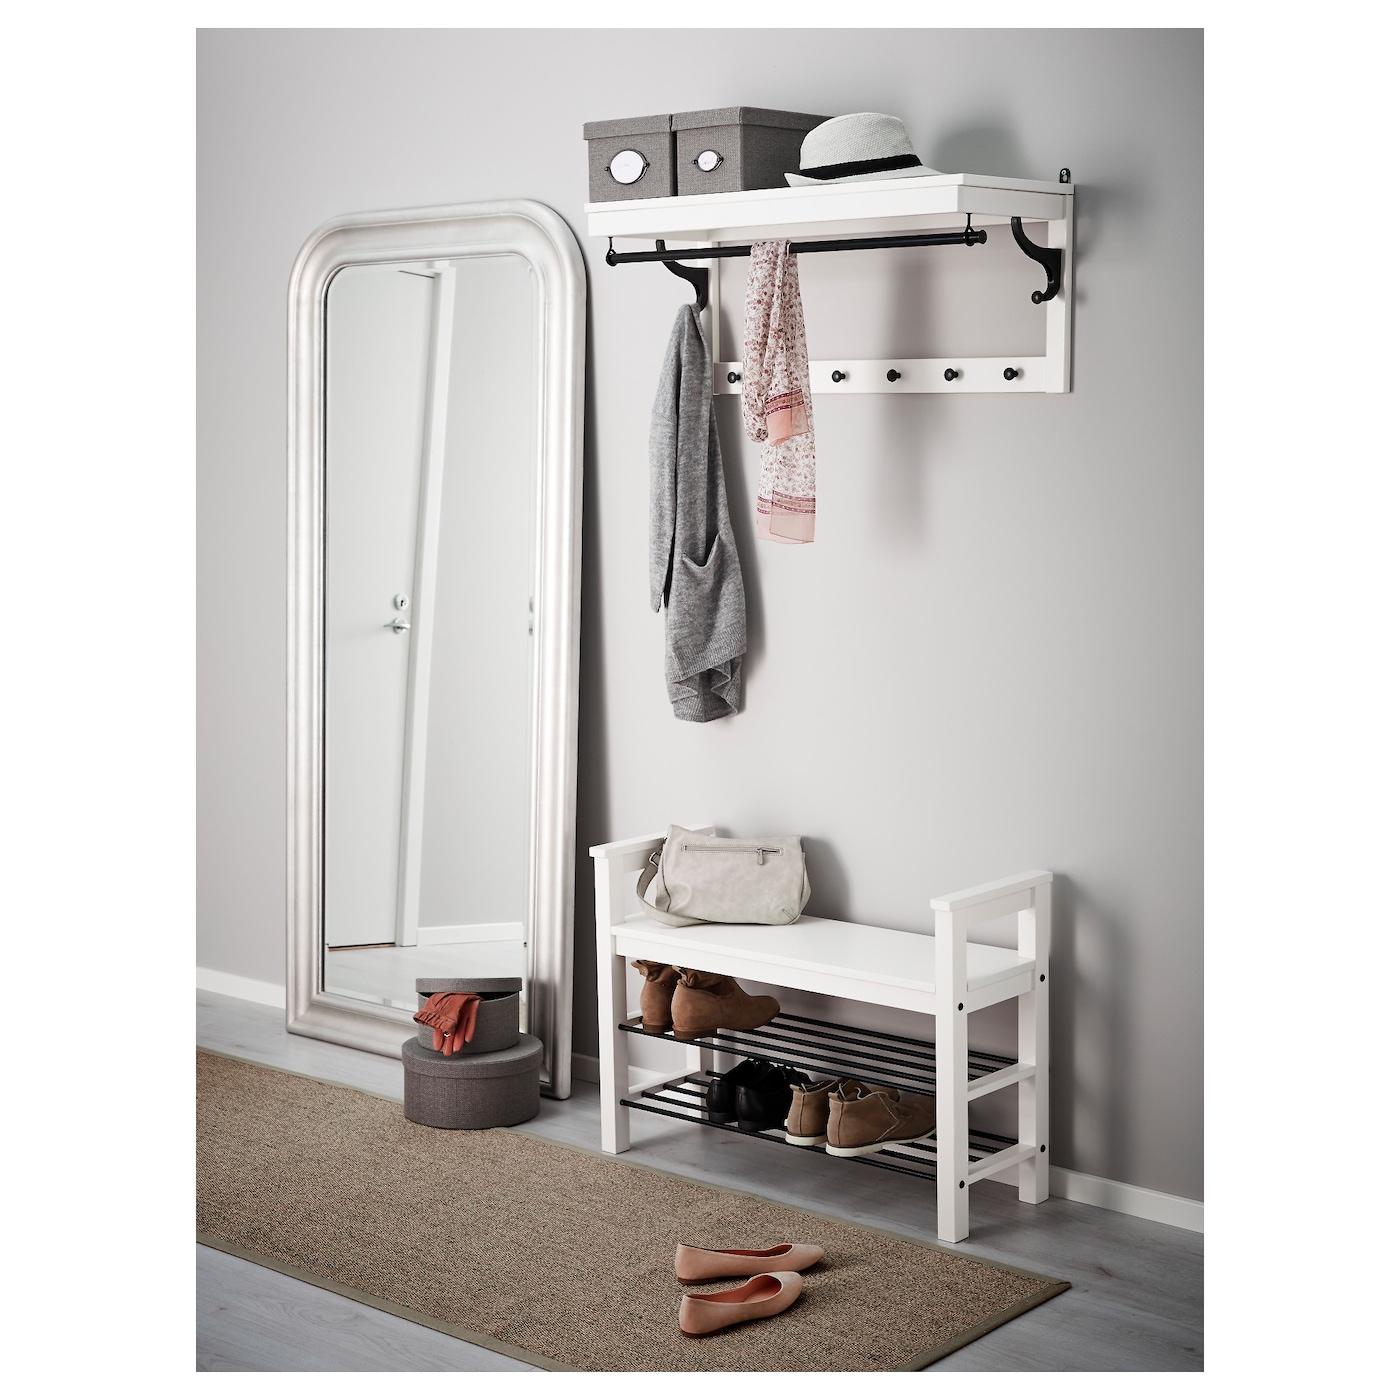 hemnes banc avec rangement chaussures blanc 85 x 32 cm ikea. Black Bedroom Furniture Sets. Home Design Ideas